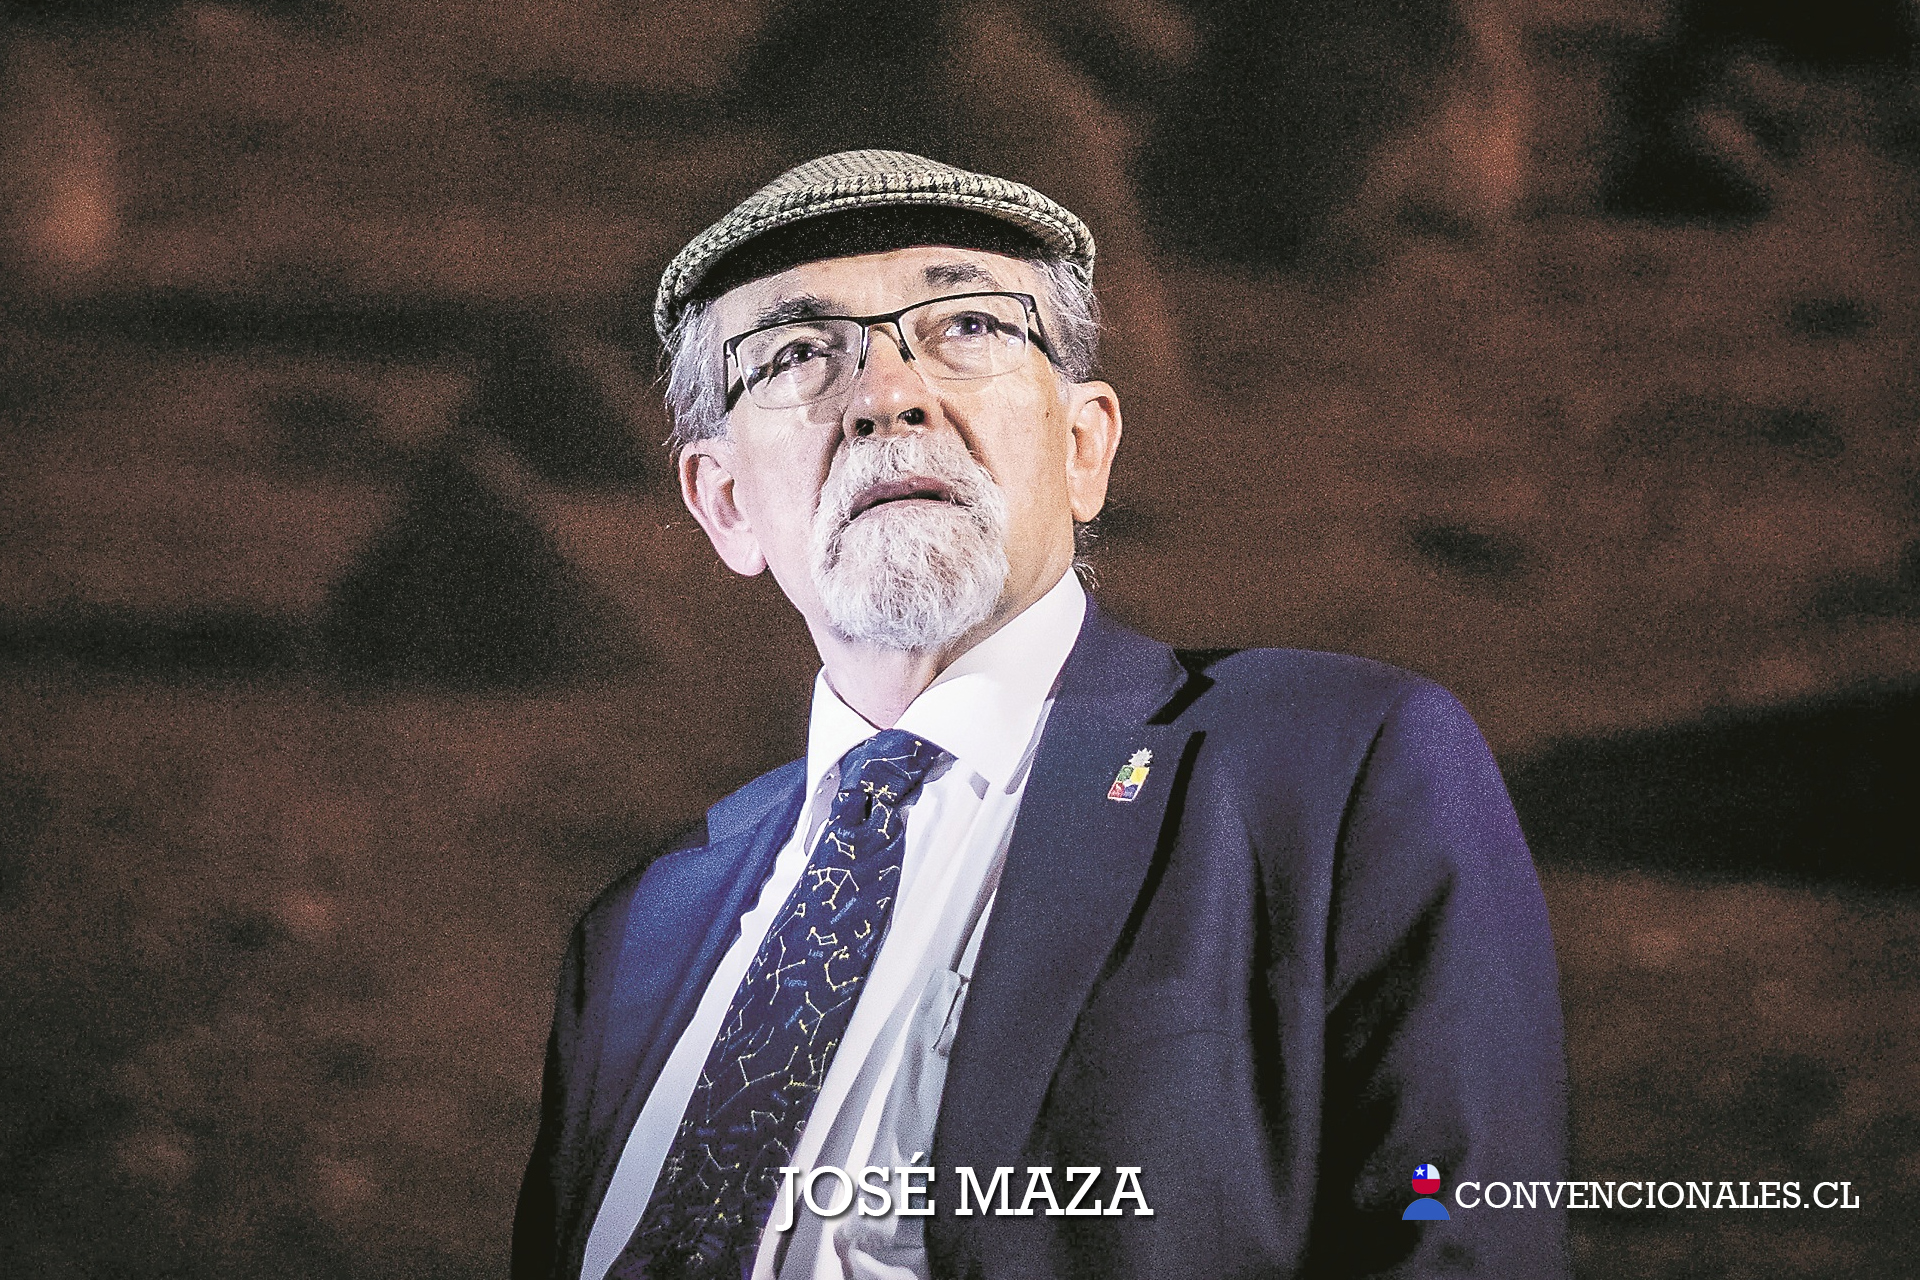 Maza, José